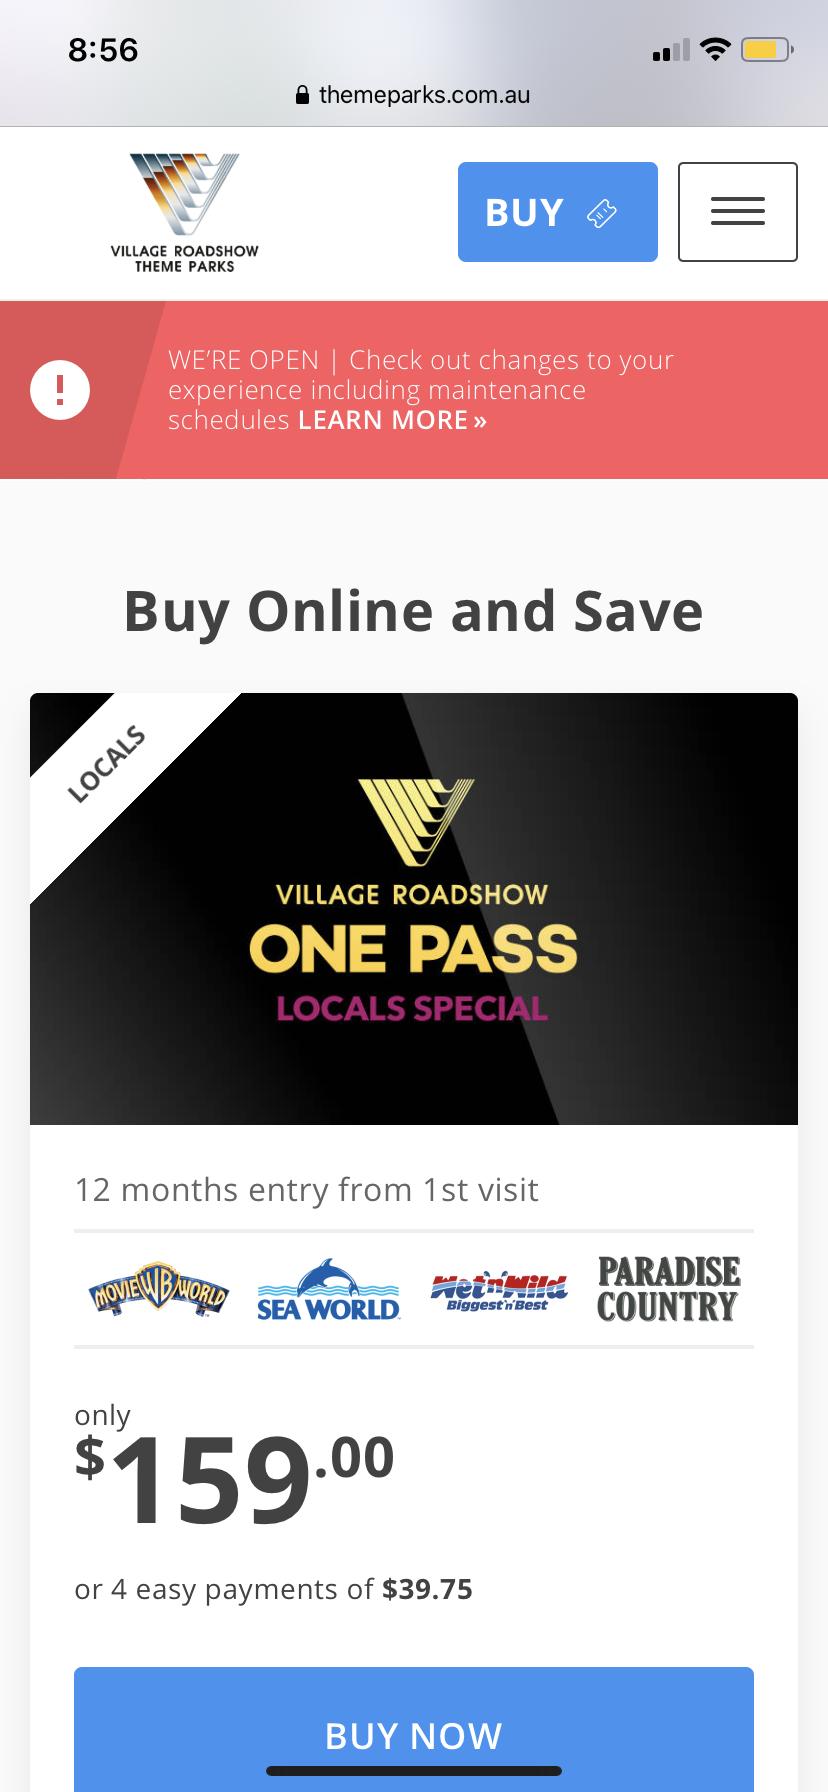 Theme Park Pass (2 adults)